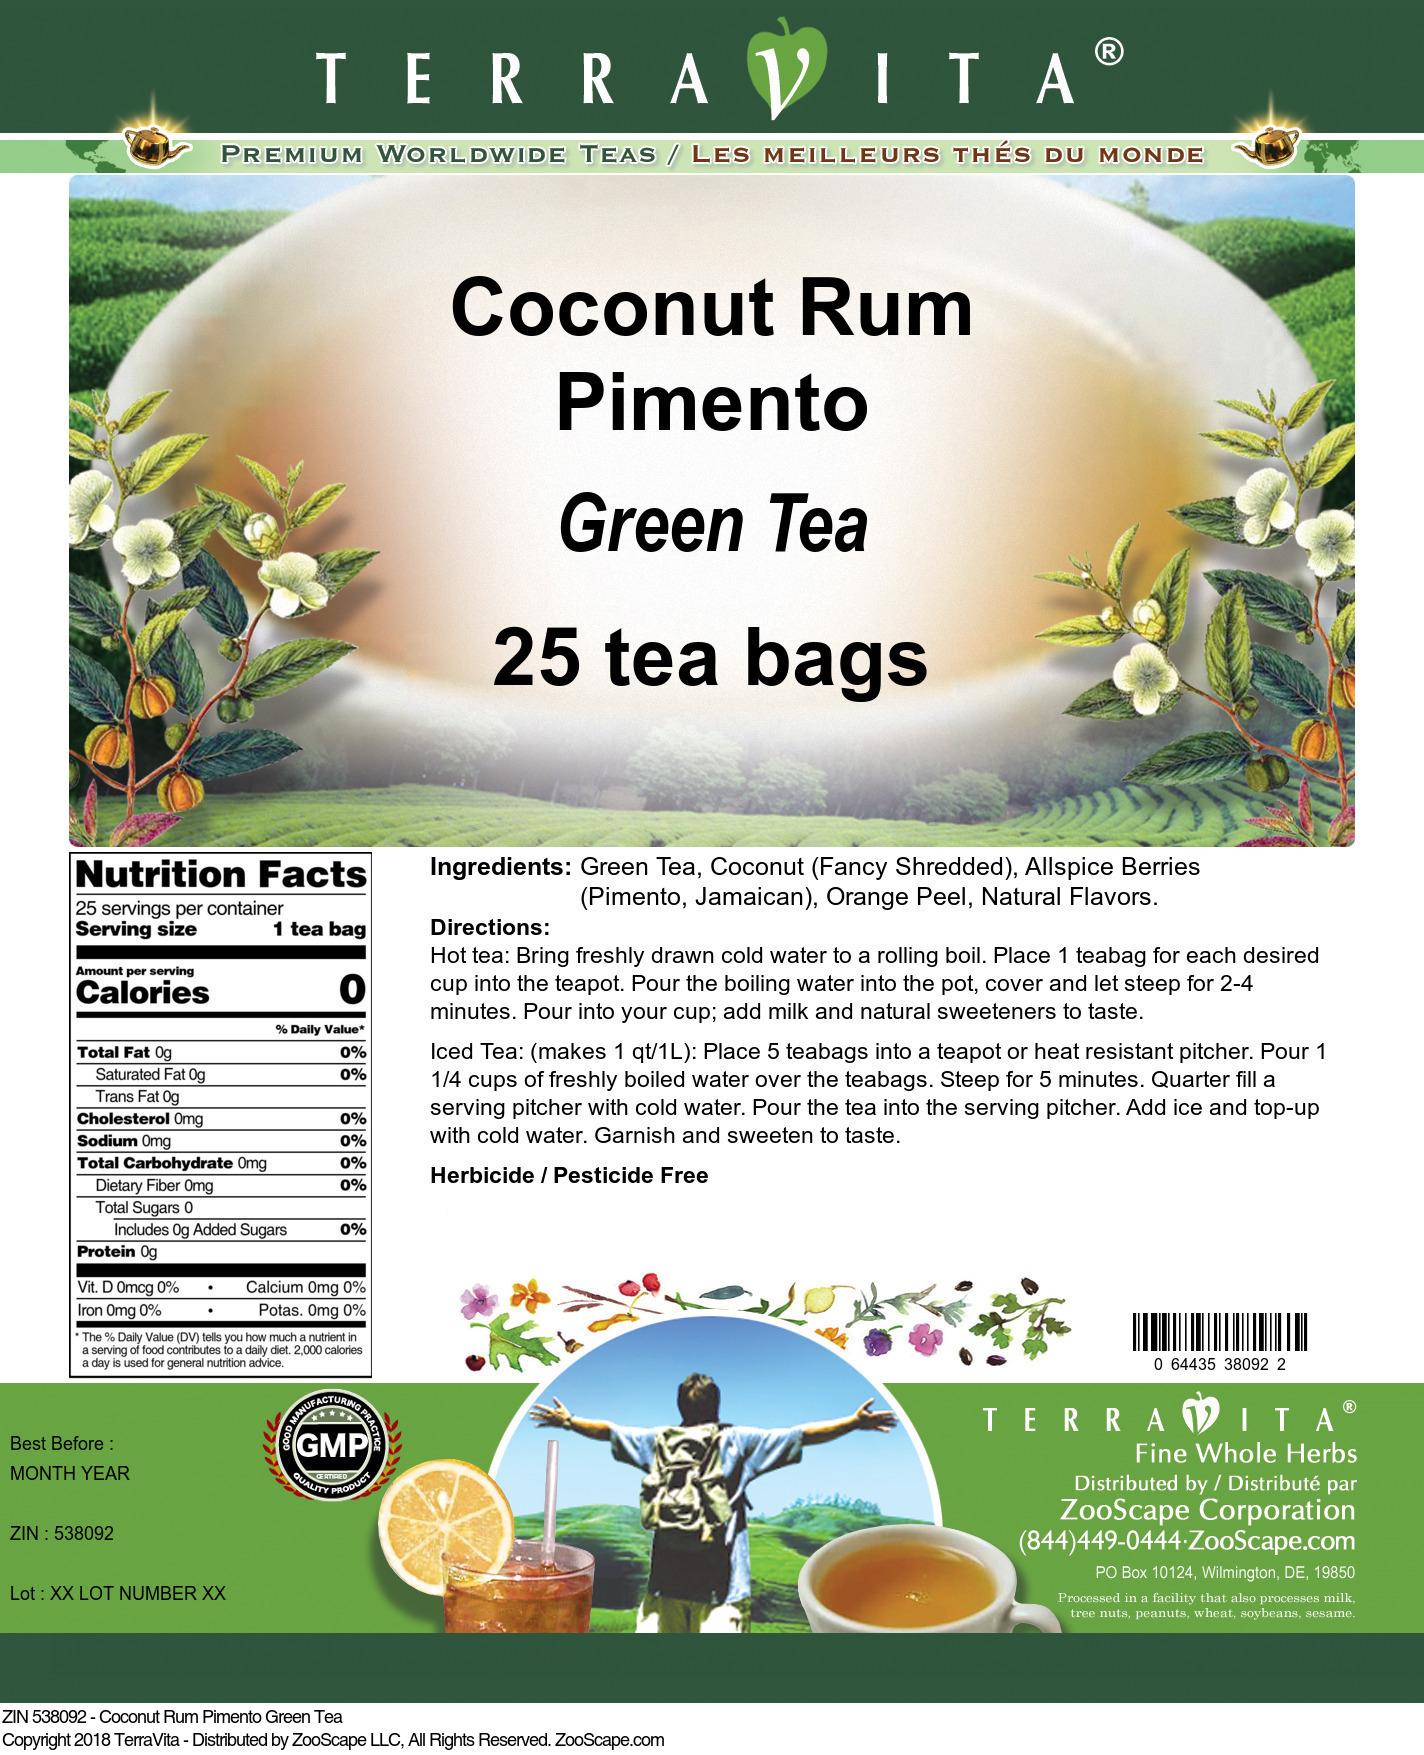 Coconut Rum Pimento Green Tea